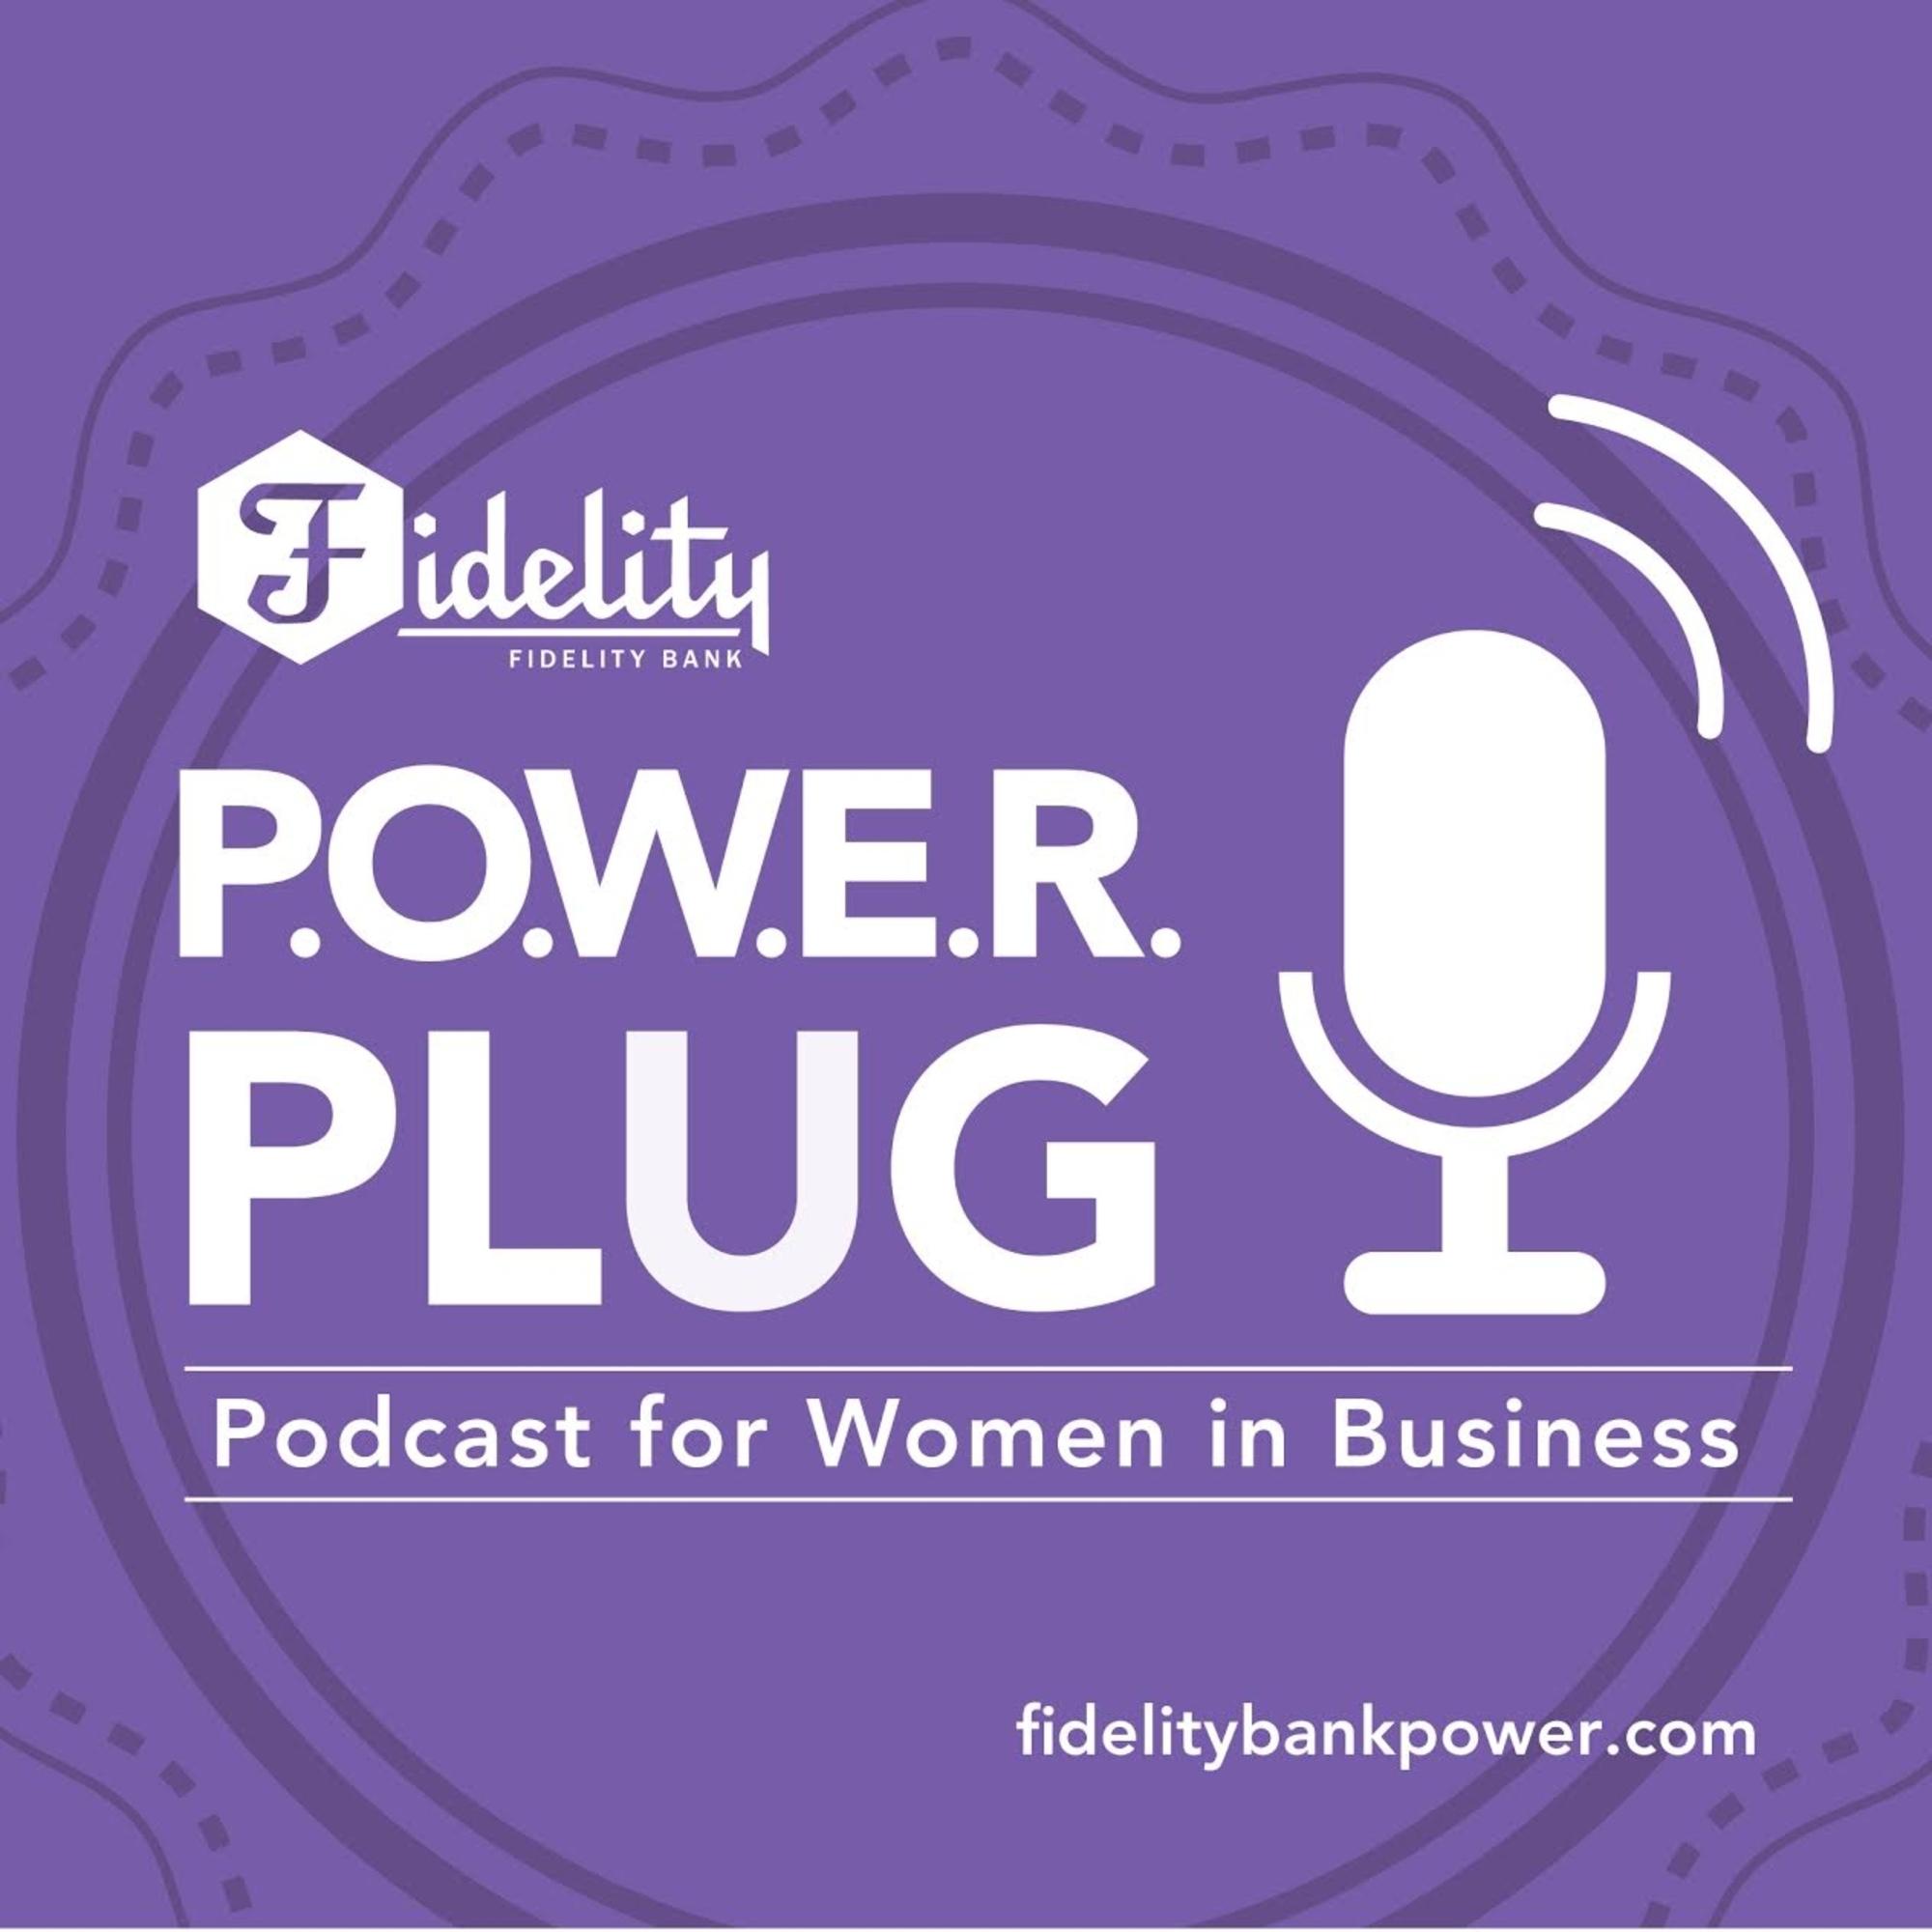 Fidelity P.O.W.E.R. Plug Podcast for Women in Business show art